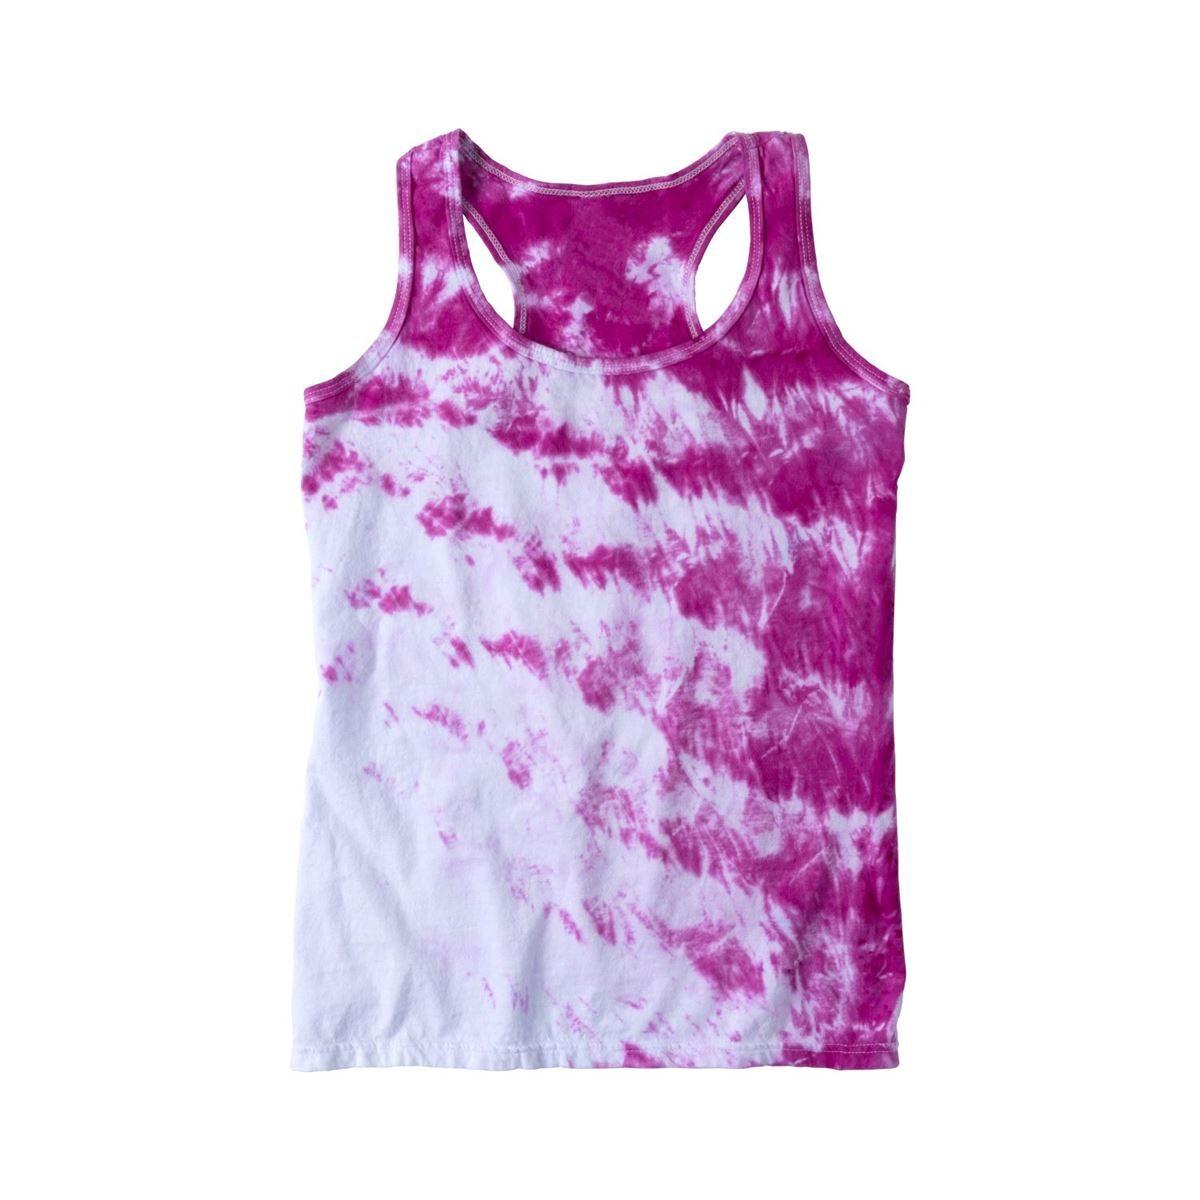 Tulip® Berry Blast Two-Minute Tie-Dye Kit